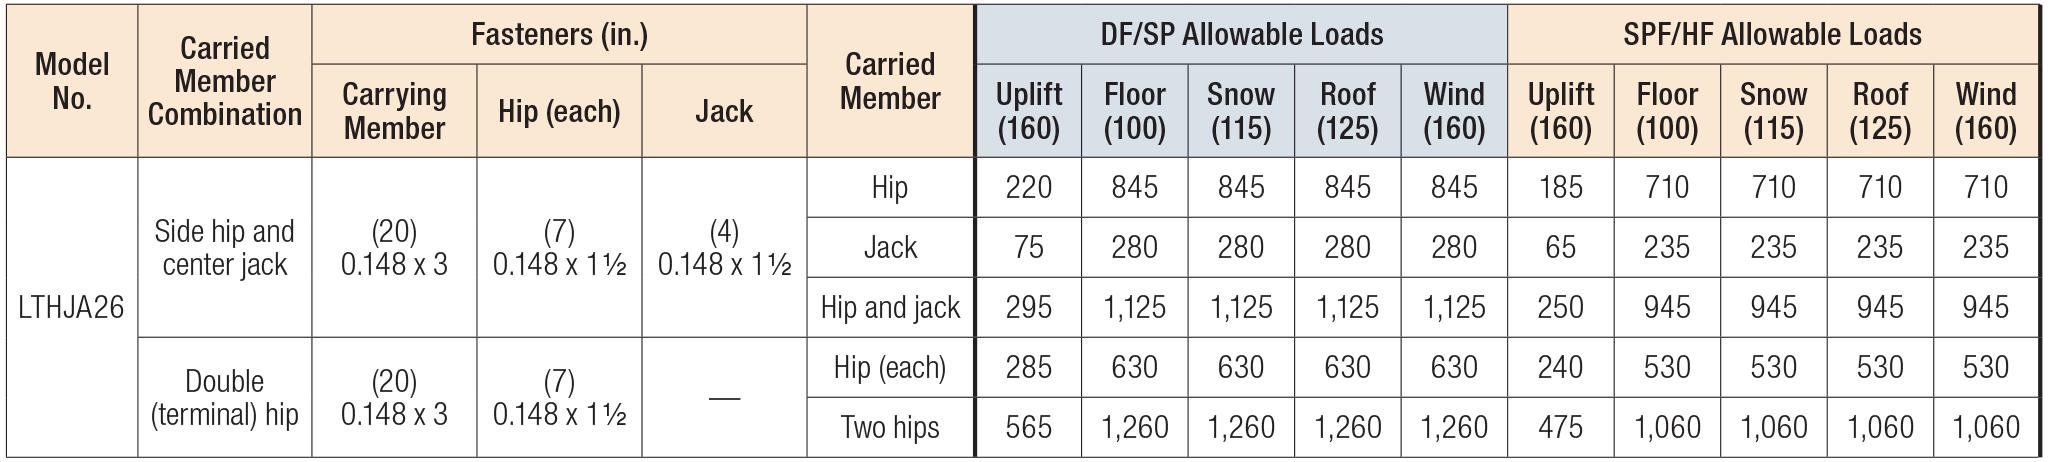 LTHJA26 Multiple-Truss Hip/Jack Hanger Load Table